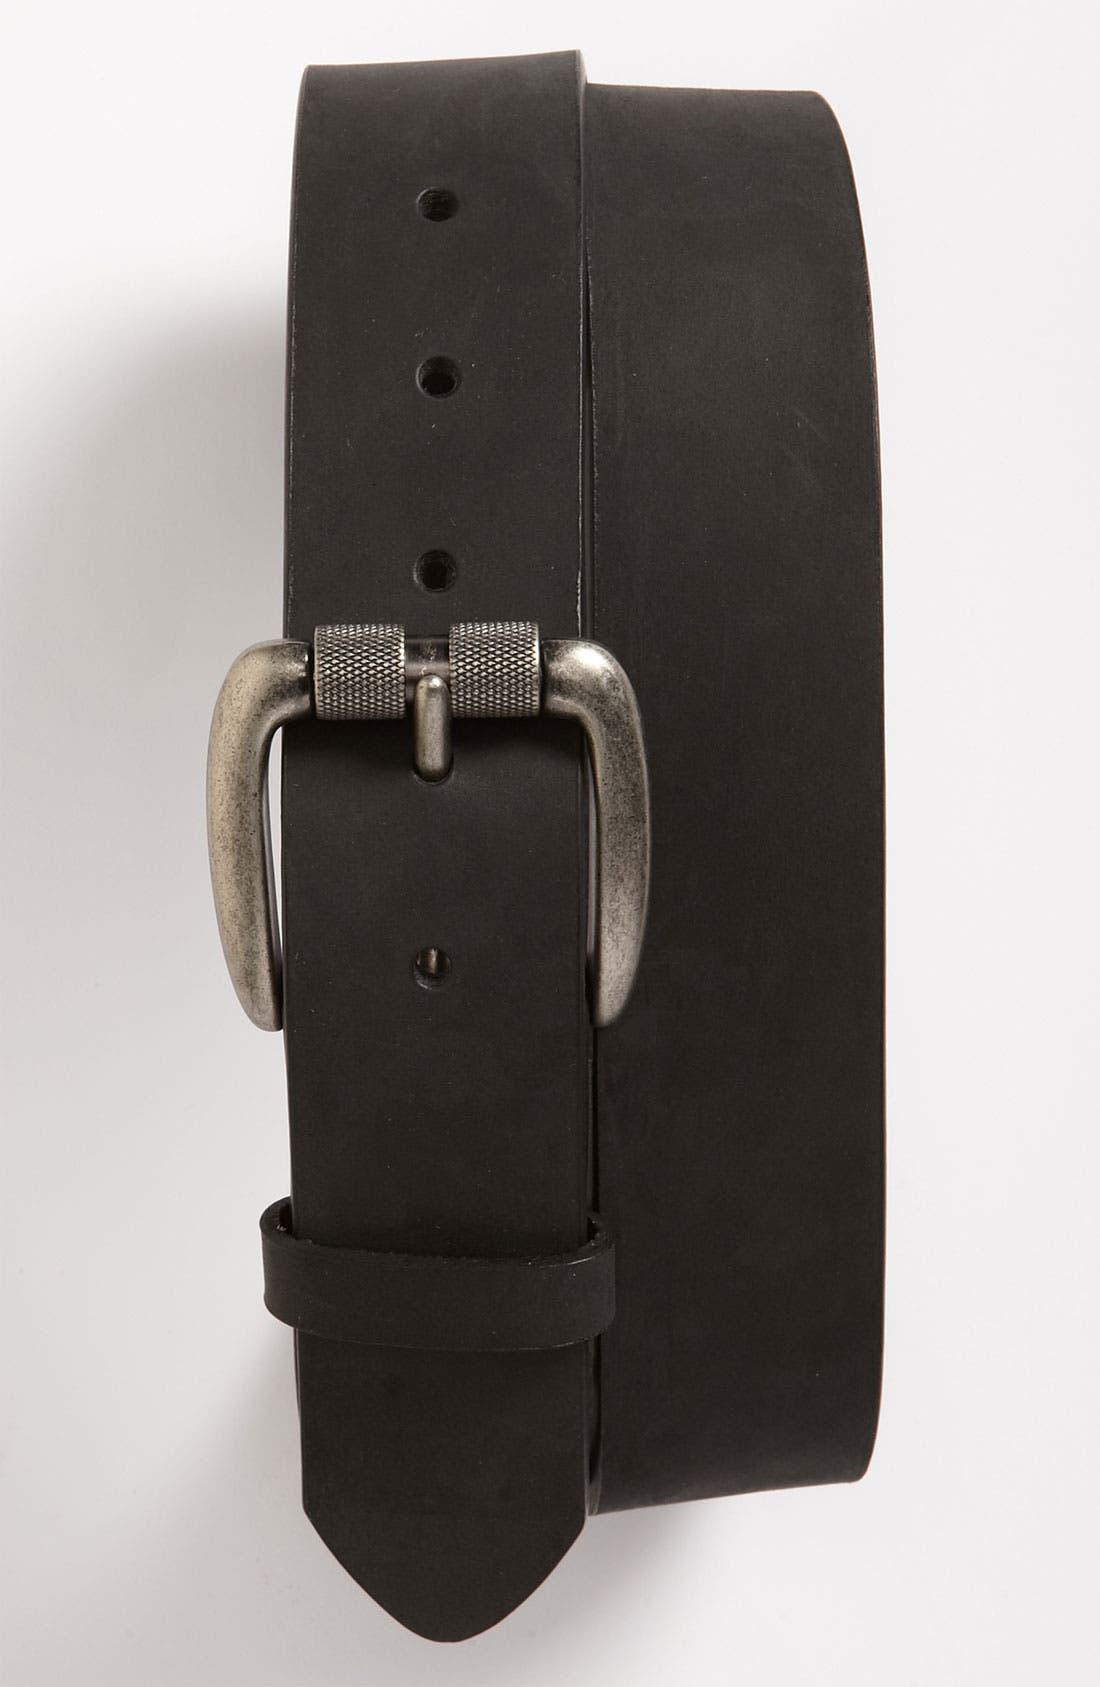 Alternate Image 1 Selected - Bill Adler 1981 Nubuck Leather Belt